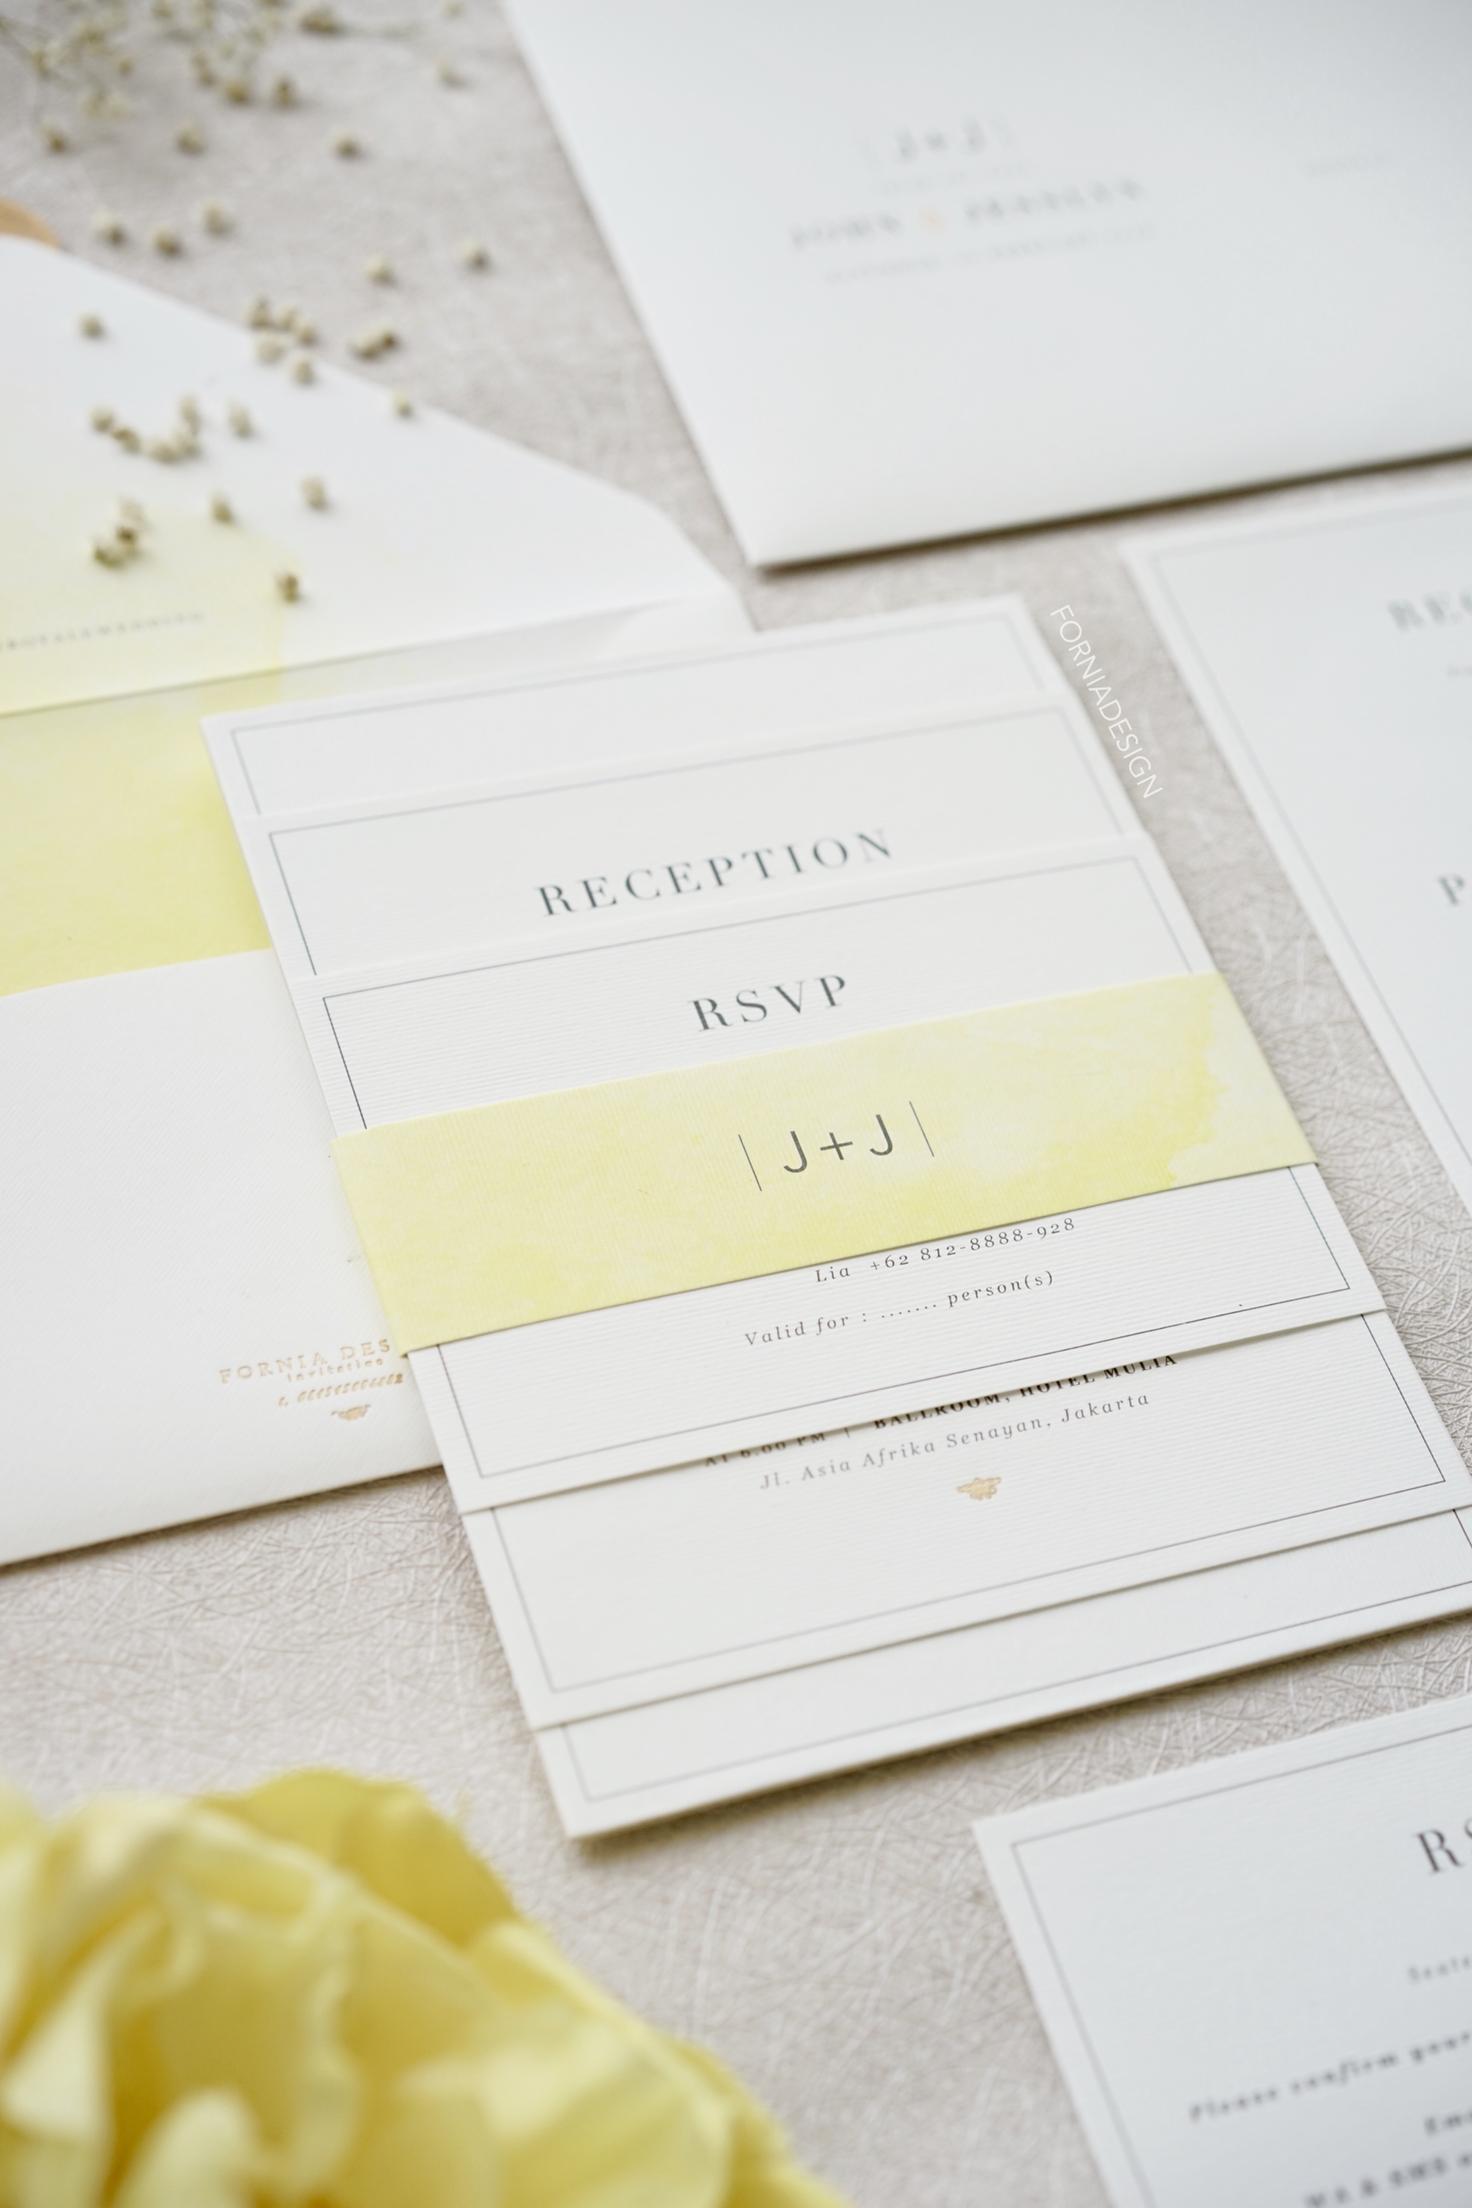 Fornia design invitation wedding invitations in jakarta fornia design invitation wedding invitations in jakarta bridestory stopboris Choice Image